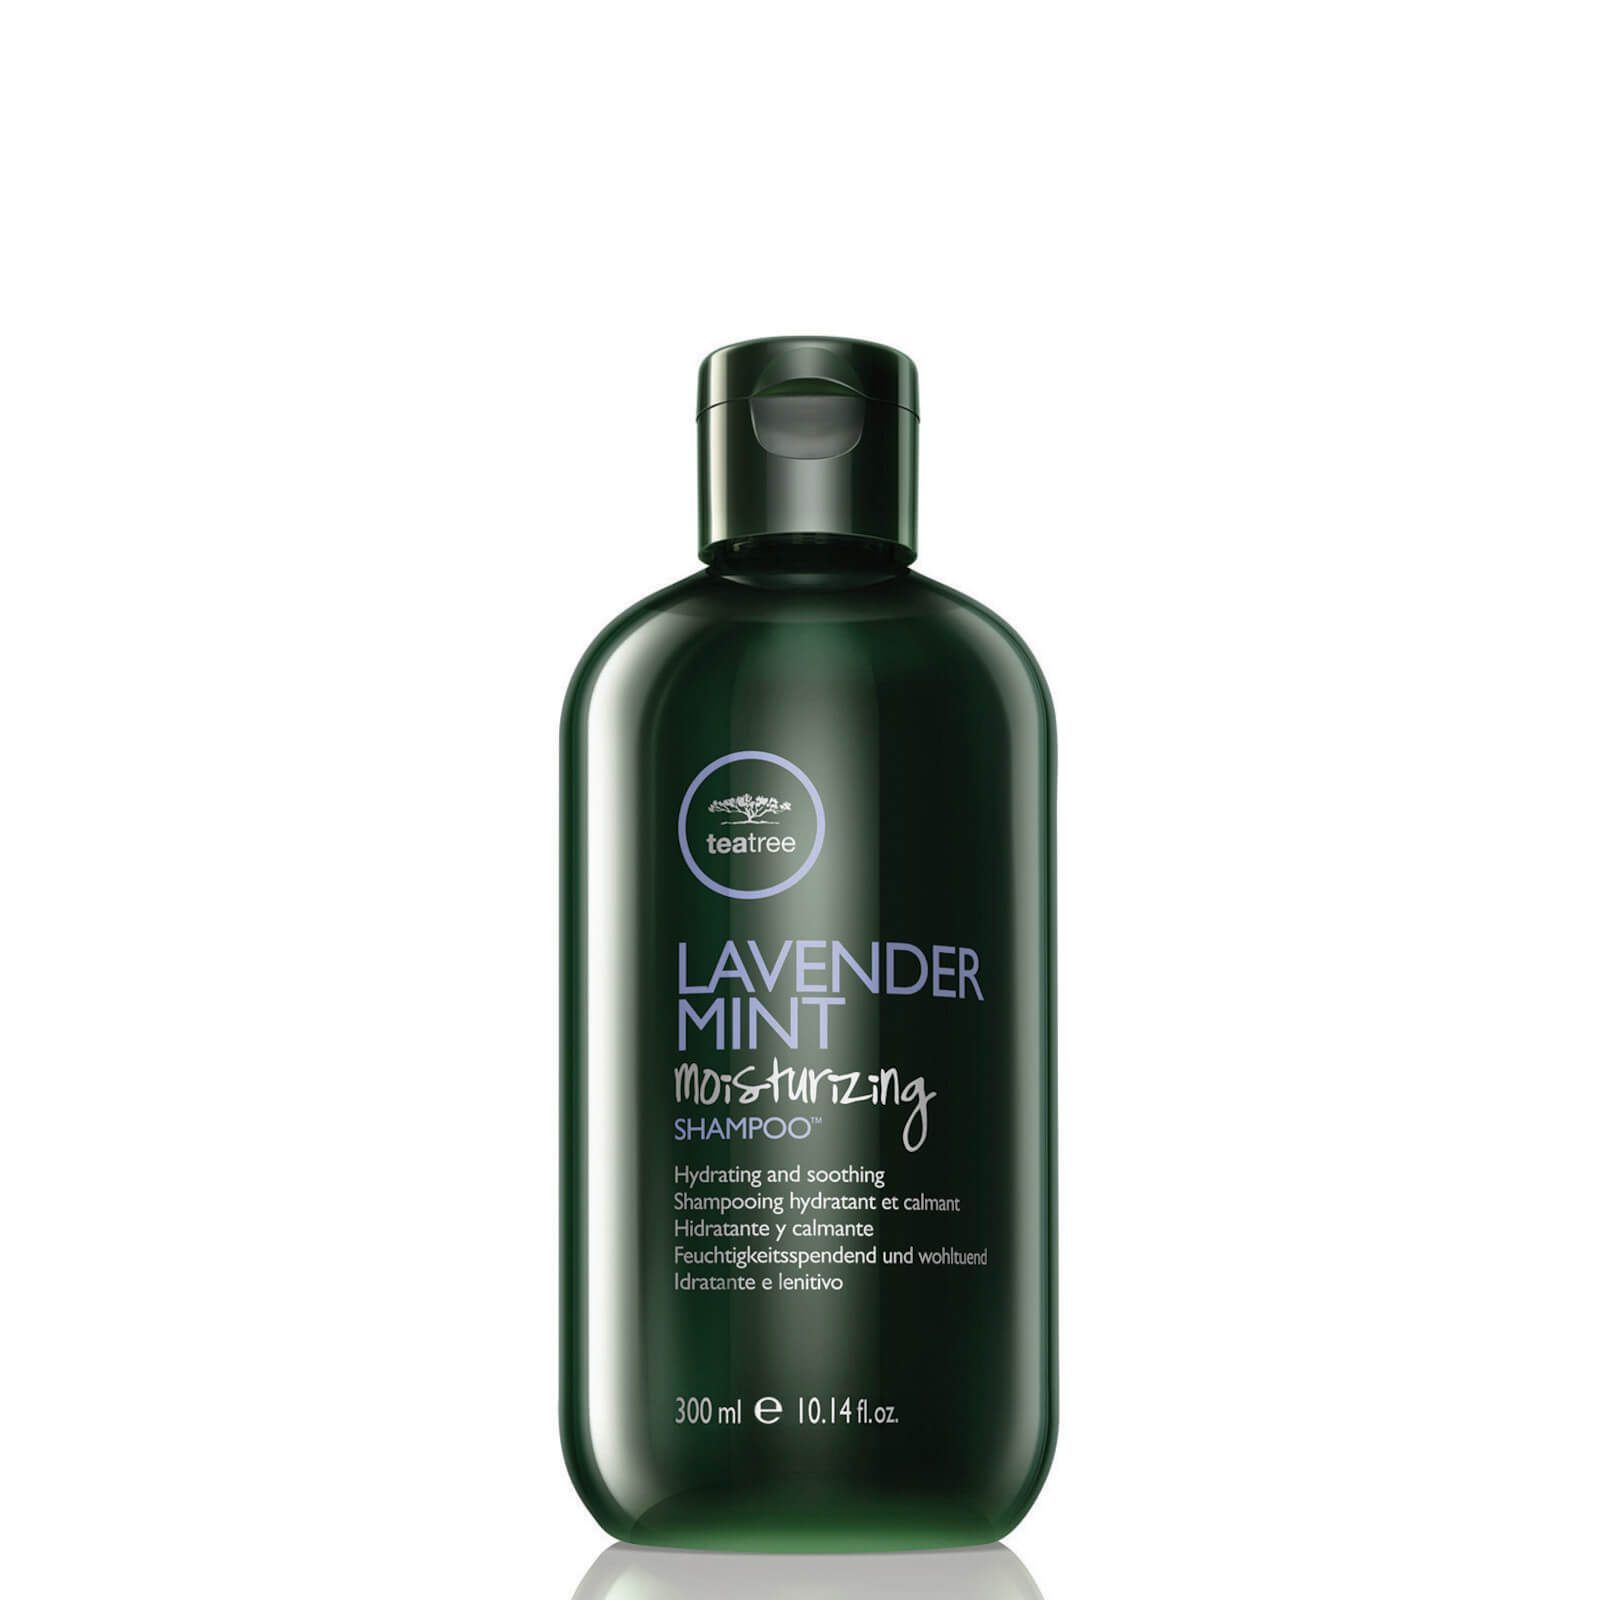 Купить Paul Mitchell Tea Tree Lavender Mint Moisturising Shampoo (300ml)